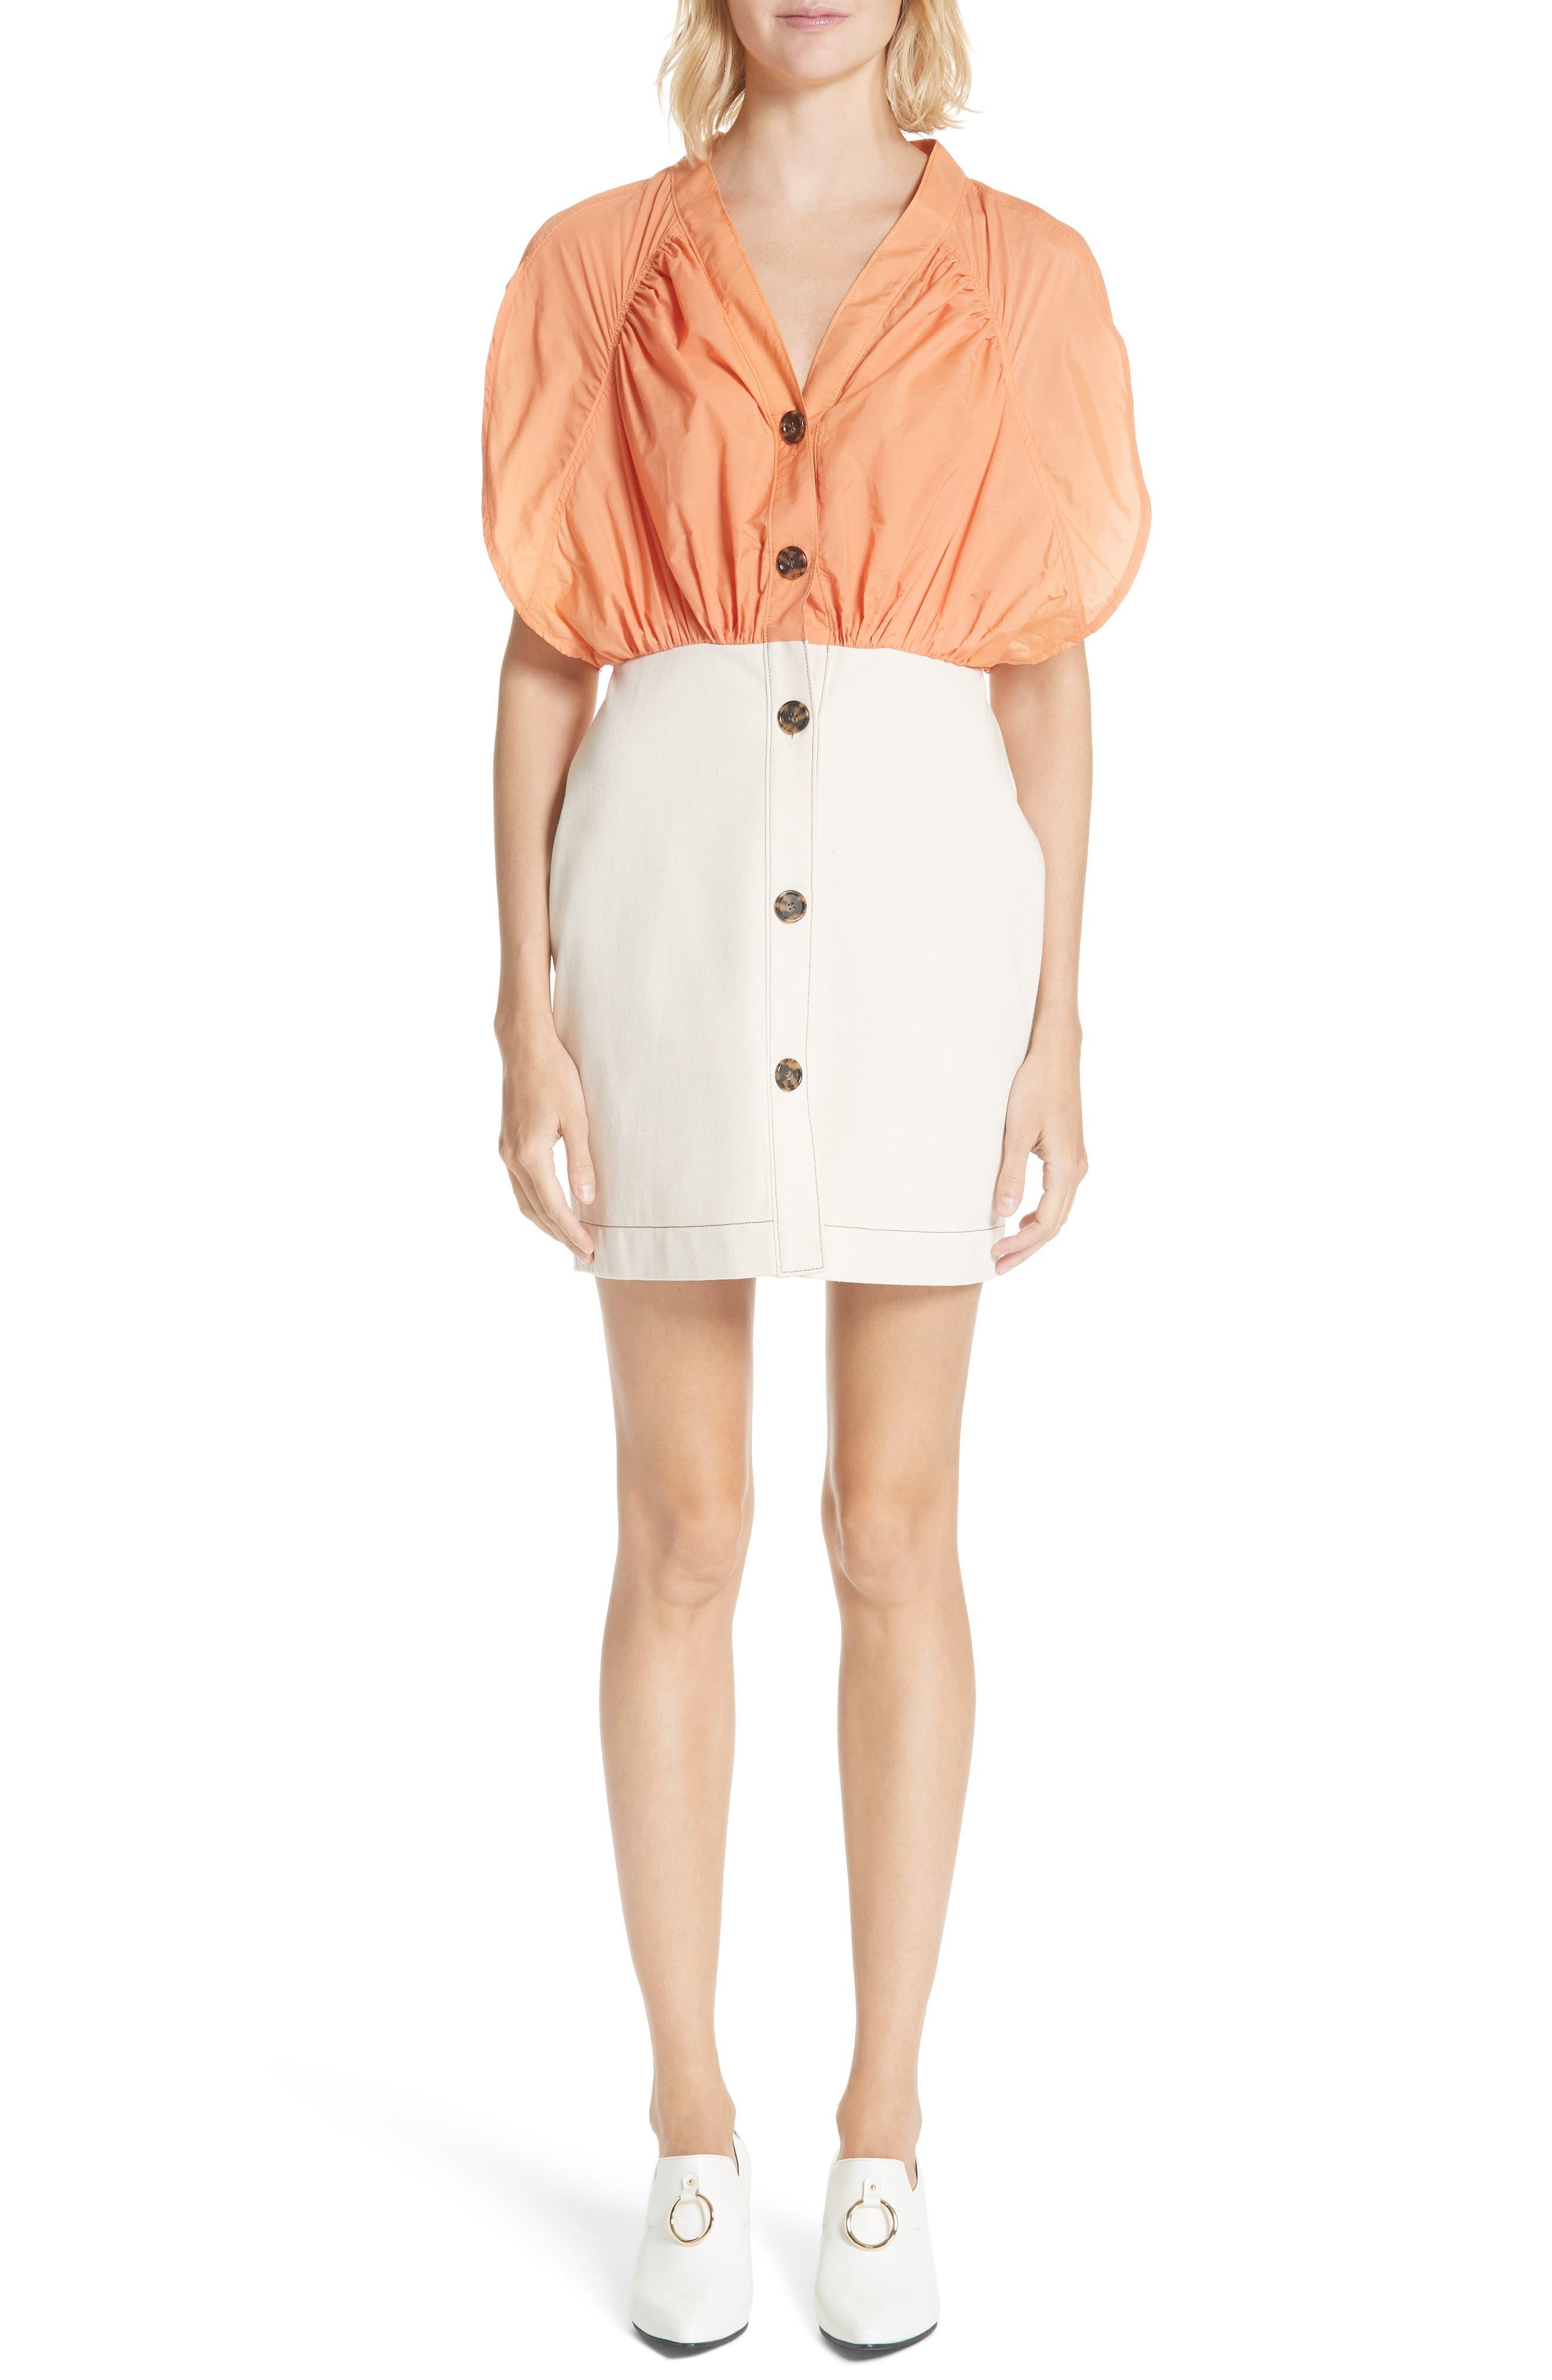 Yana Bicolor Dress,                         Main,                         color, Cotton Orange/ Denim Ecru